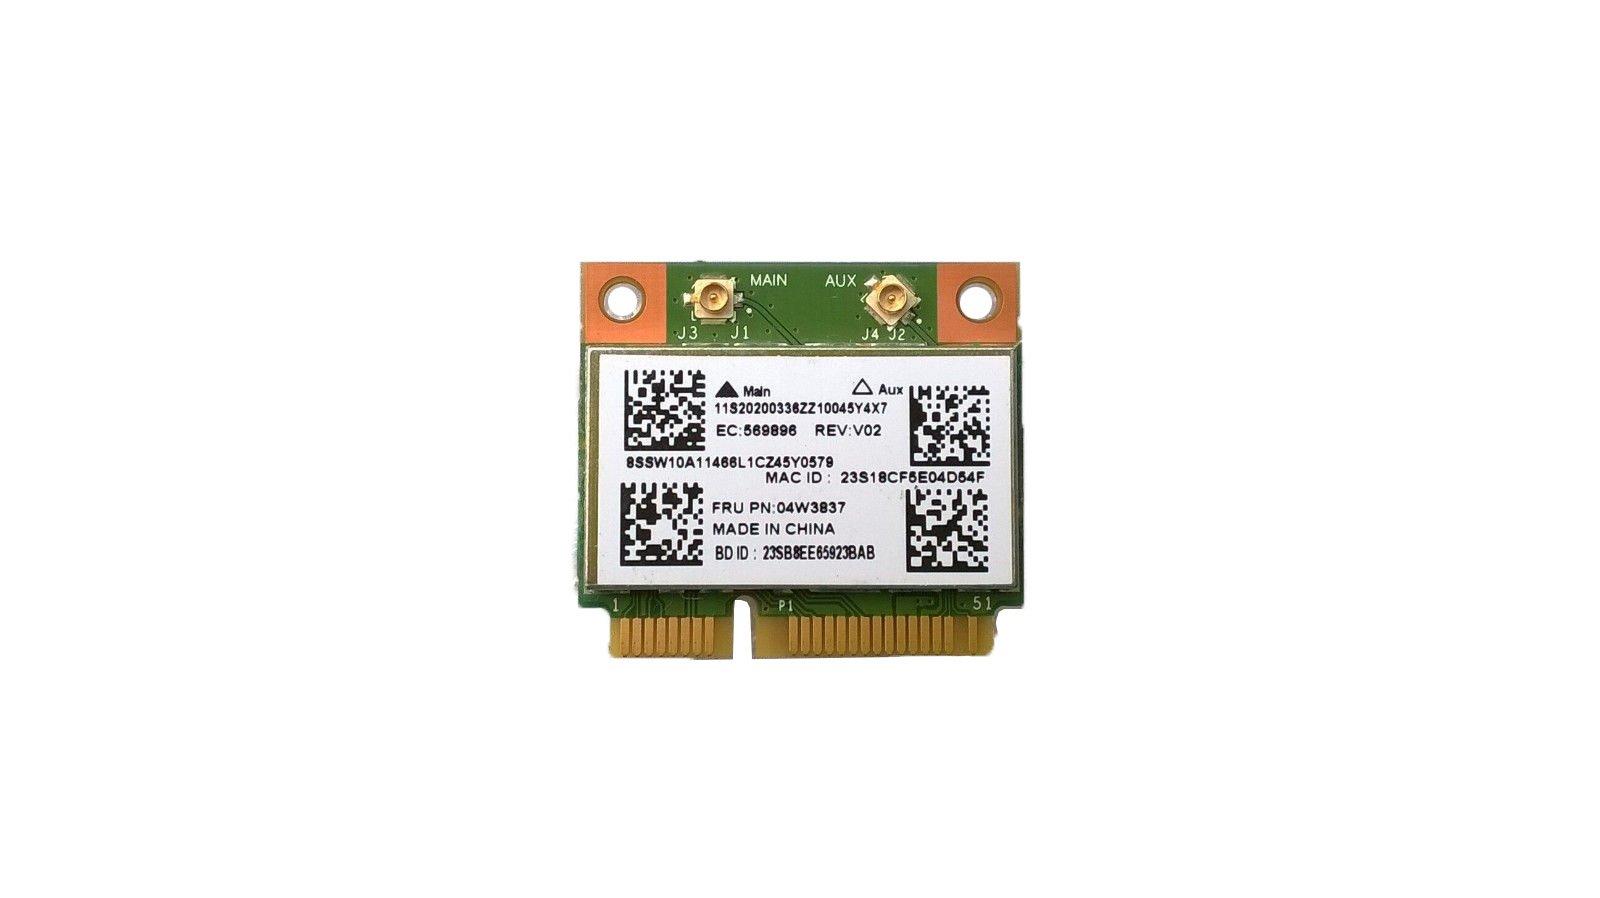 802.11BGN WiFi&Bluetooth 4.0 for Lenovo G400/G410/G500/G510/G405/G505/E431/E531/E430C/E530C/E135/E145/X140E/S431/S531/L430/L530/E535/E330/E335/E435/E545 by aPower Plus